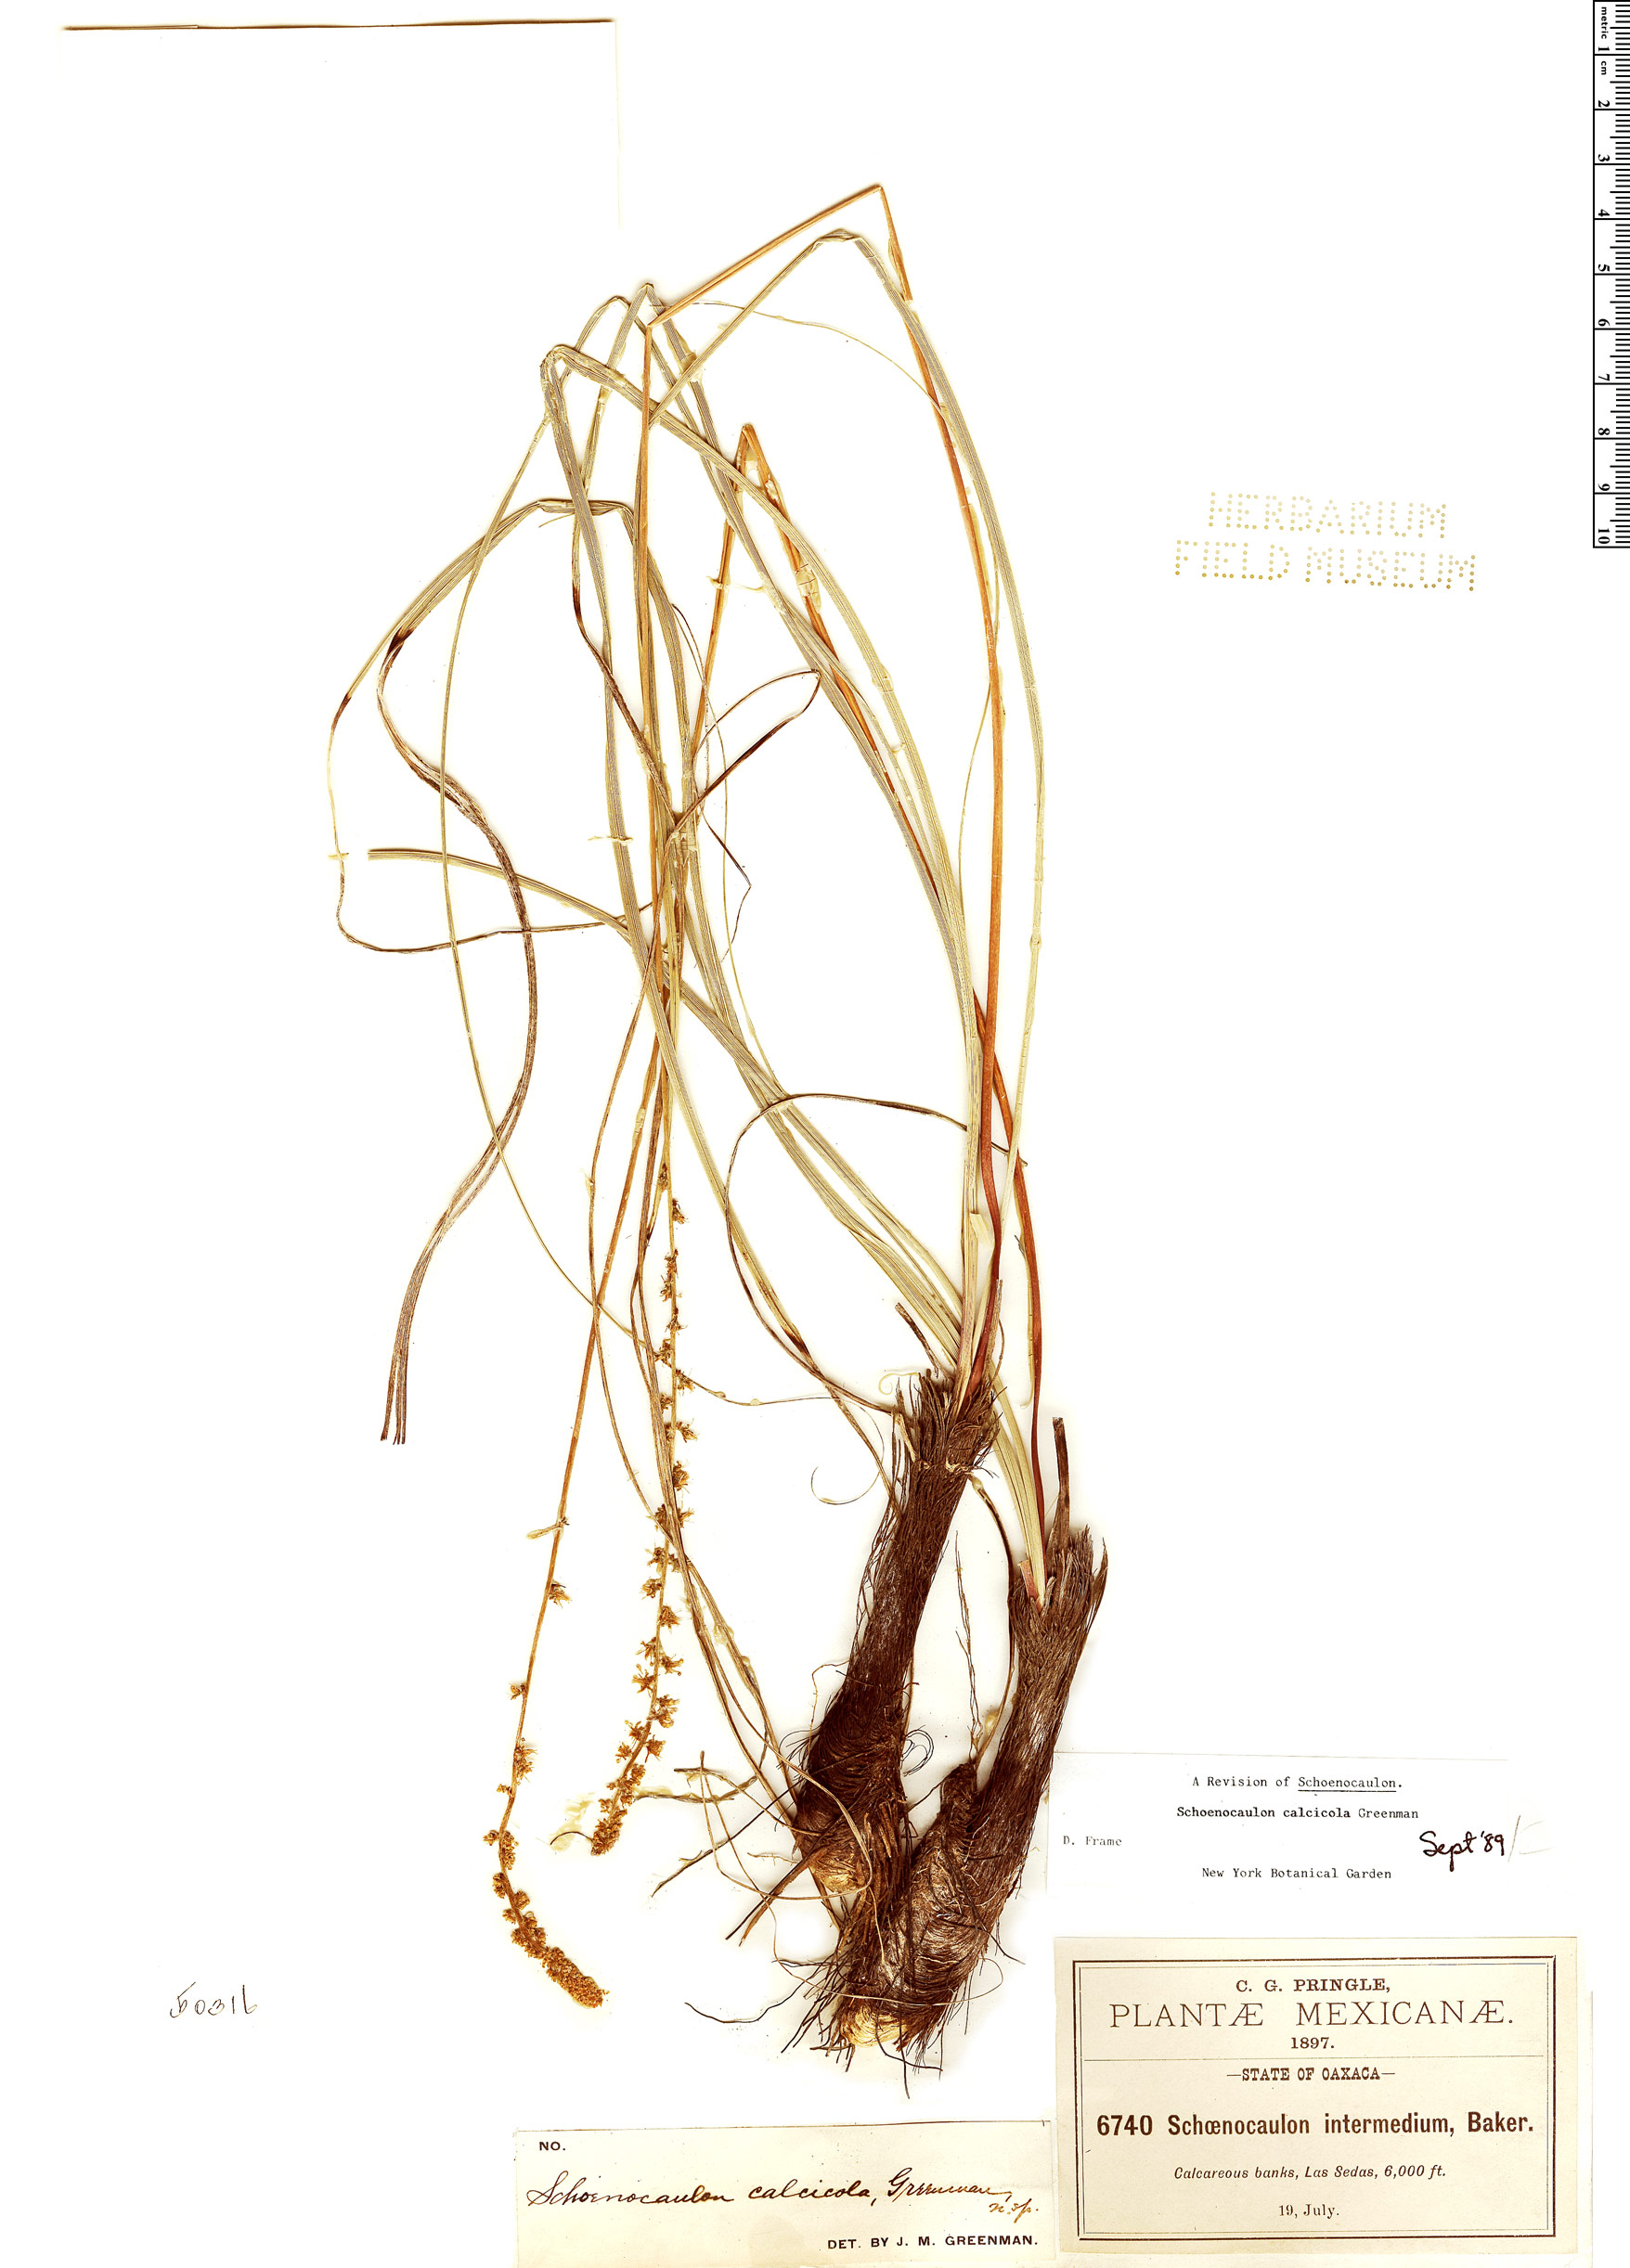 Specimen: Schoenocaulon calcicola